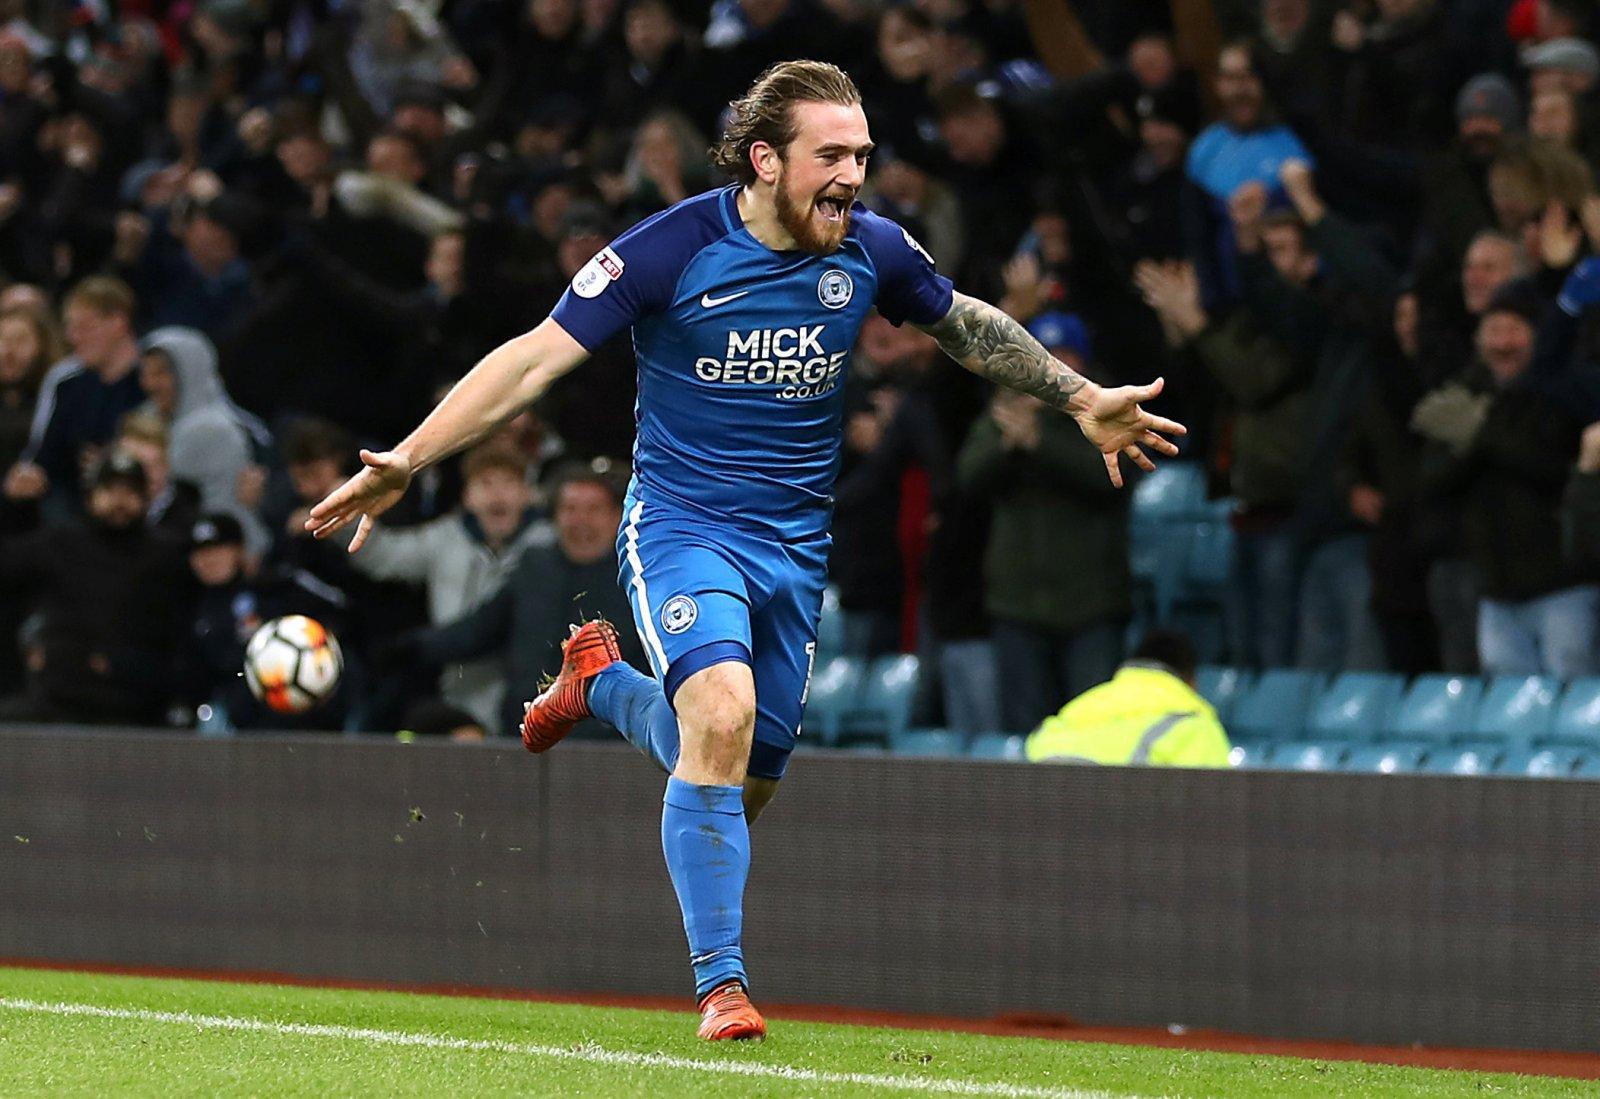 Rangers interested in 33-goal striker – Sky Sources